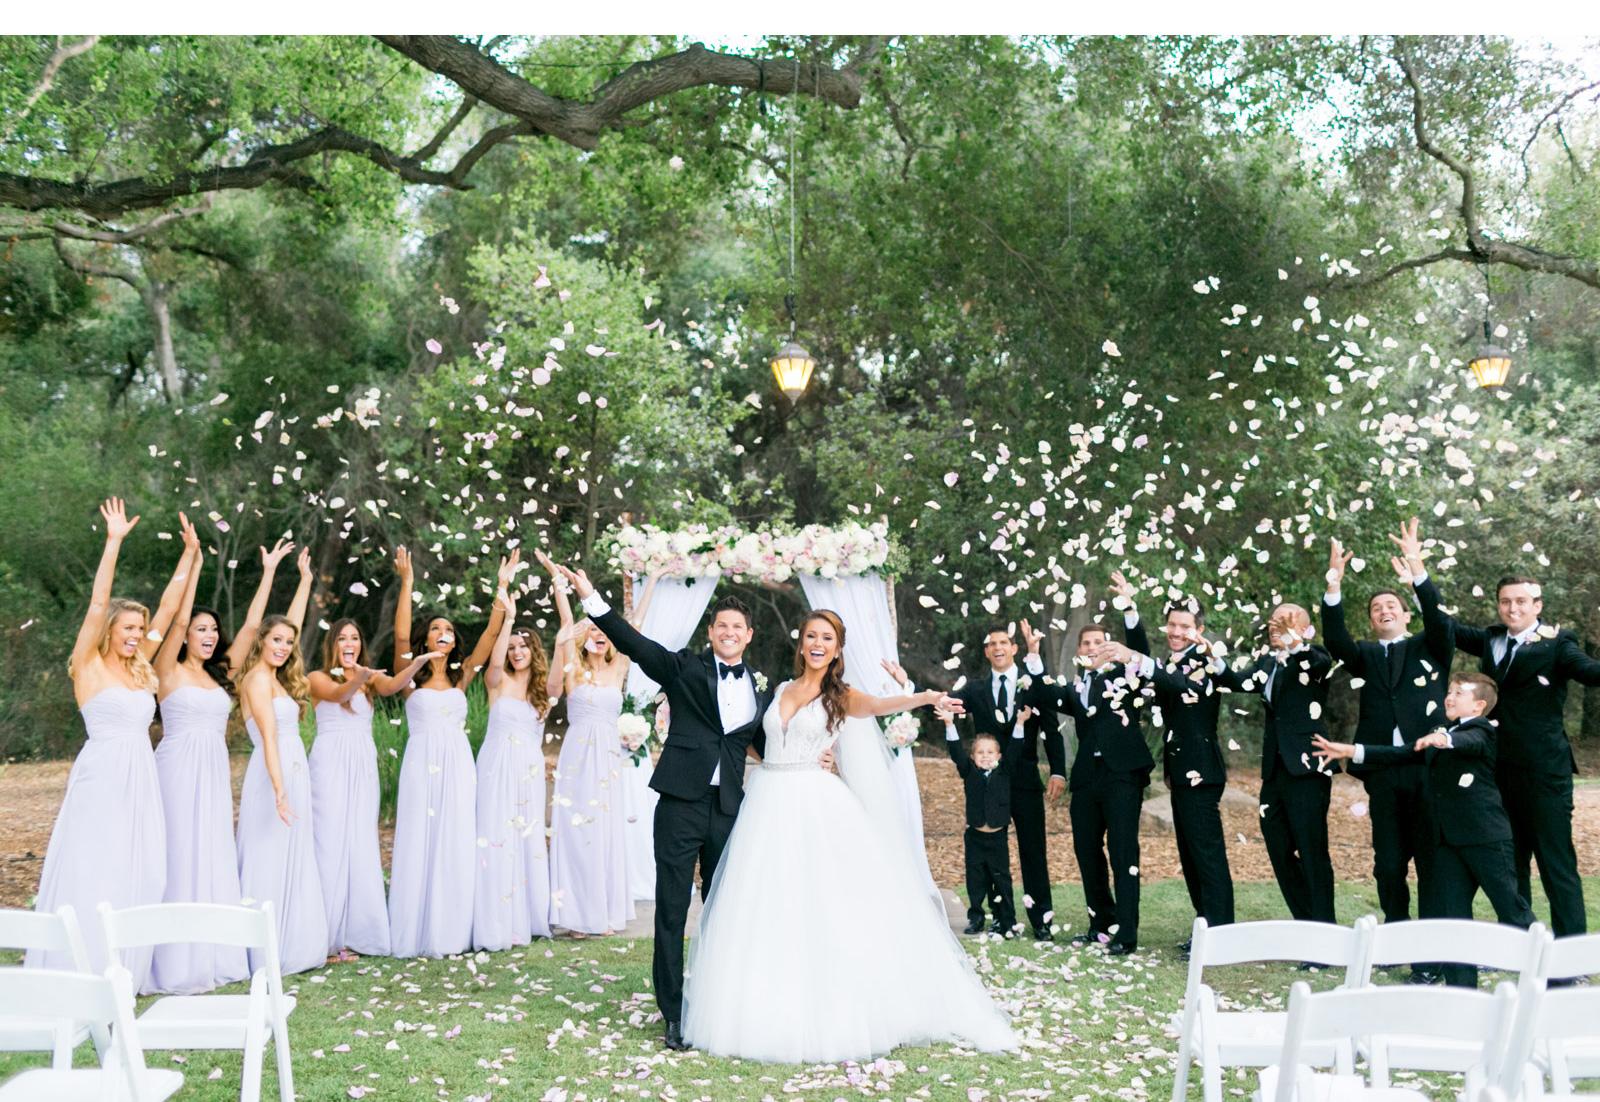 Miss-USA-Nia-Sanchez-Temecula-Wedding-Natalie-Schutt-Photography_07.jpg